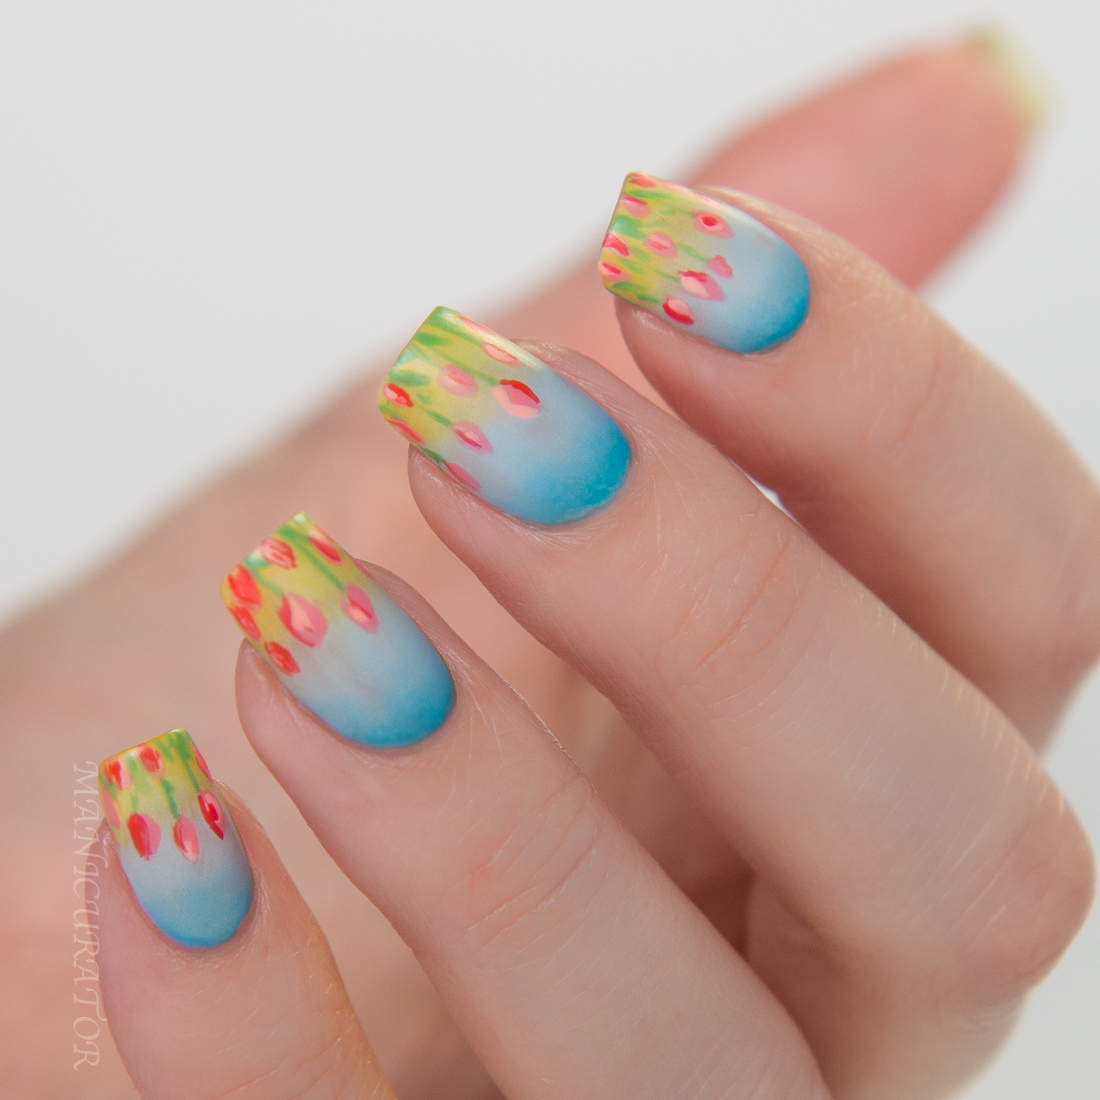 China-Glaze-Road-Trip-Freehand-Tulip-Nail-Art